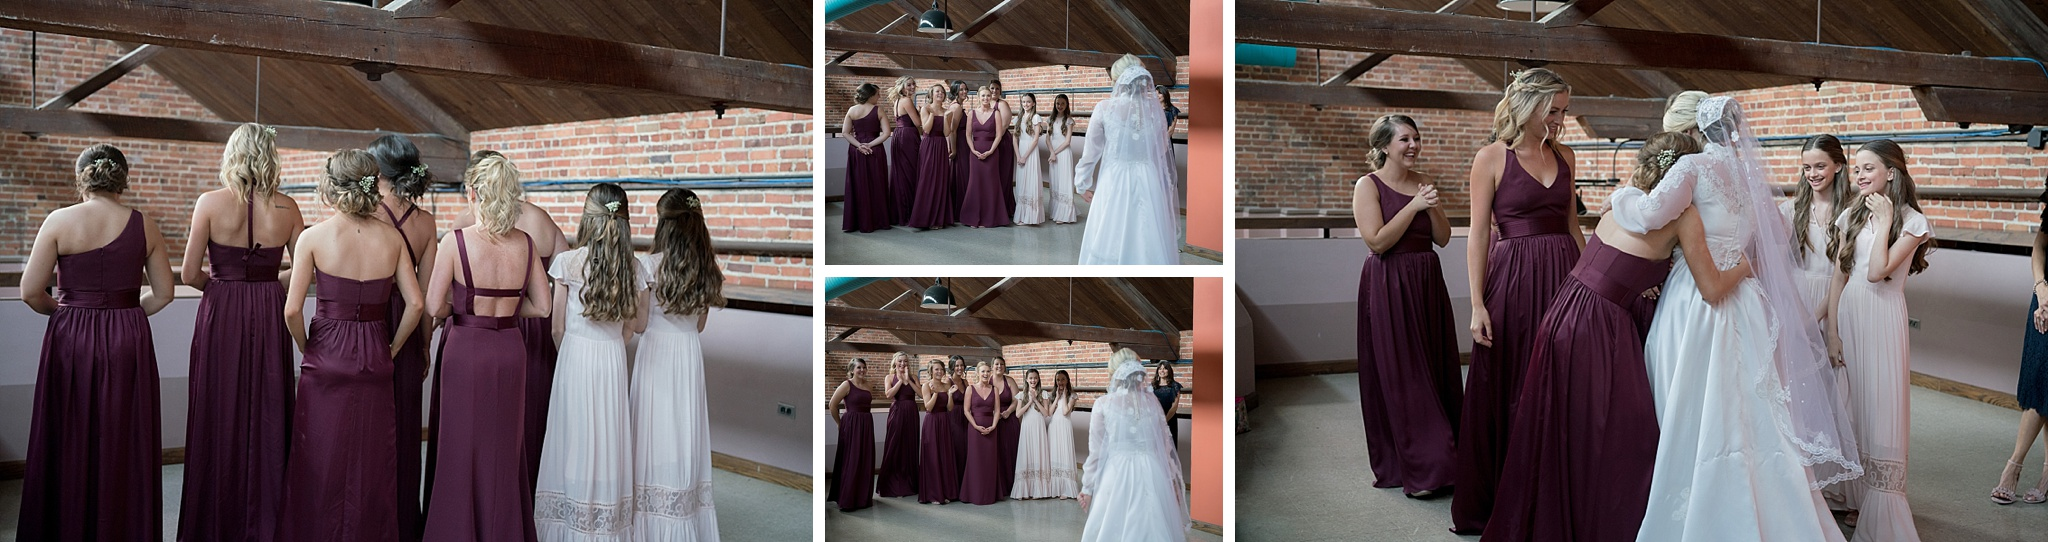 Washington-NC-Wedding-Photography-161.jpg